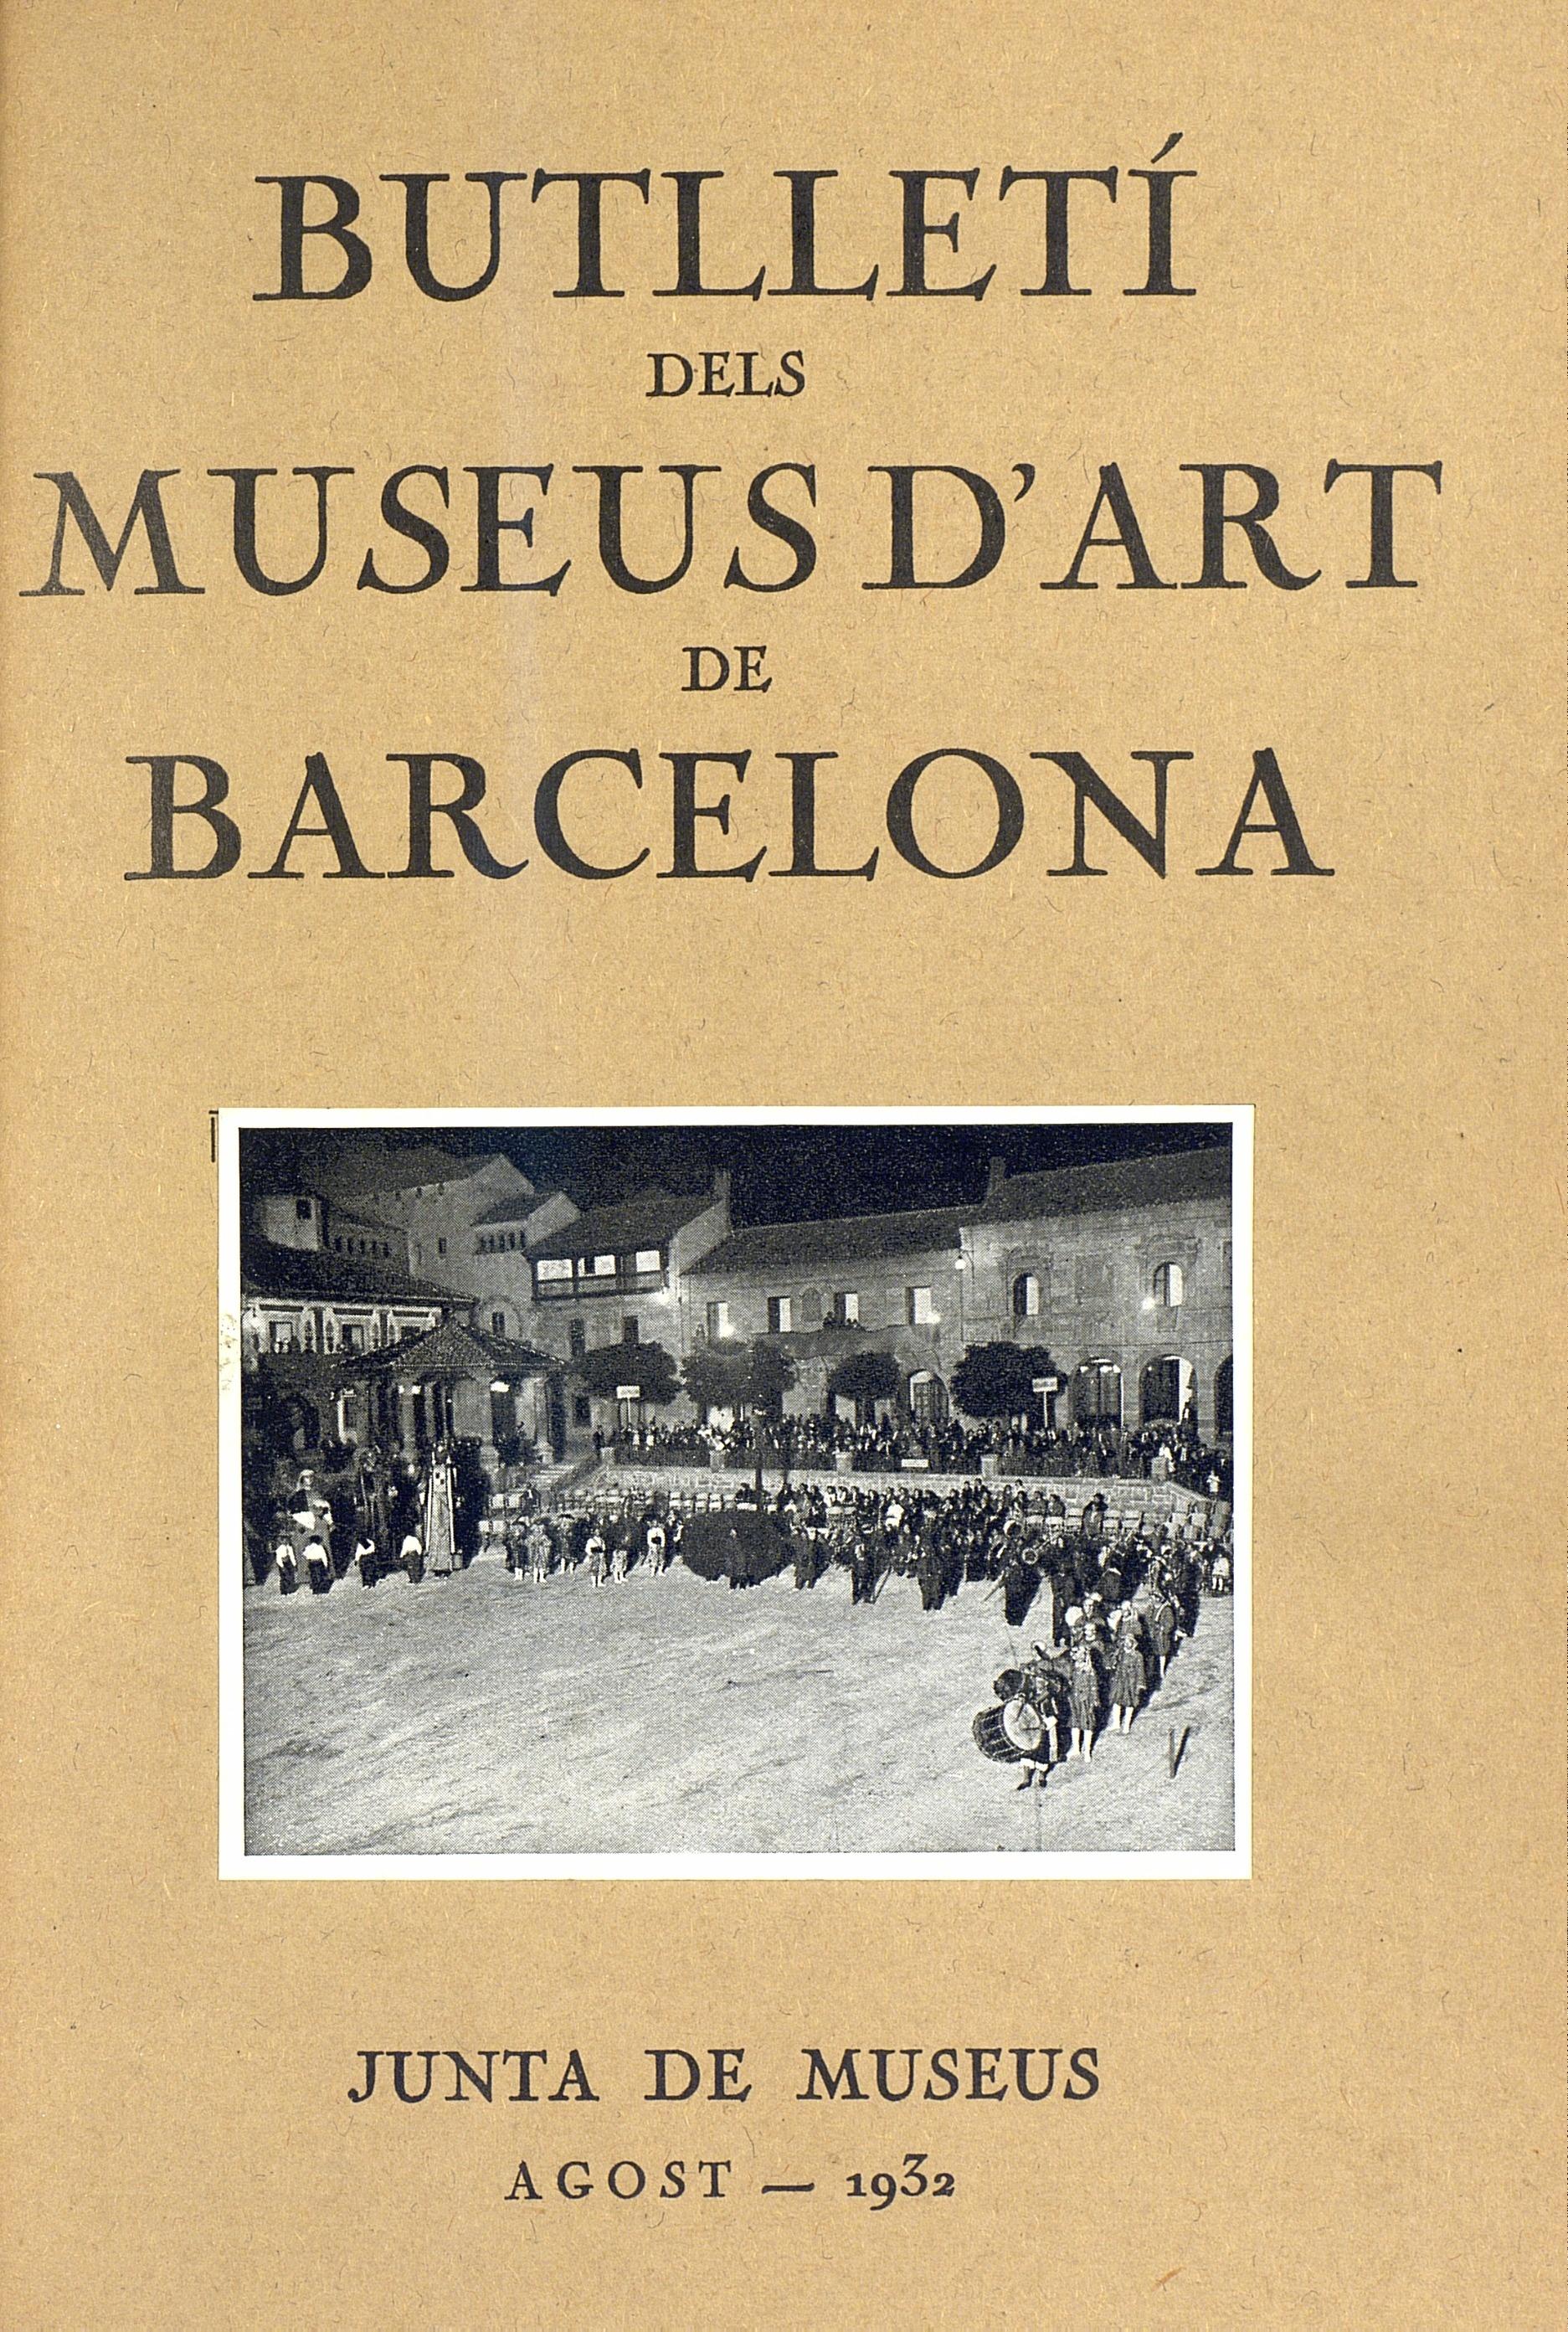 Vol. 2, núm. 15 (agost 1932)